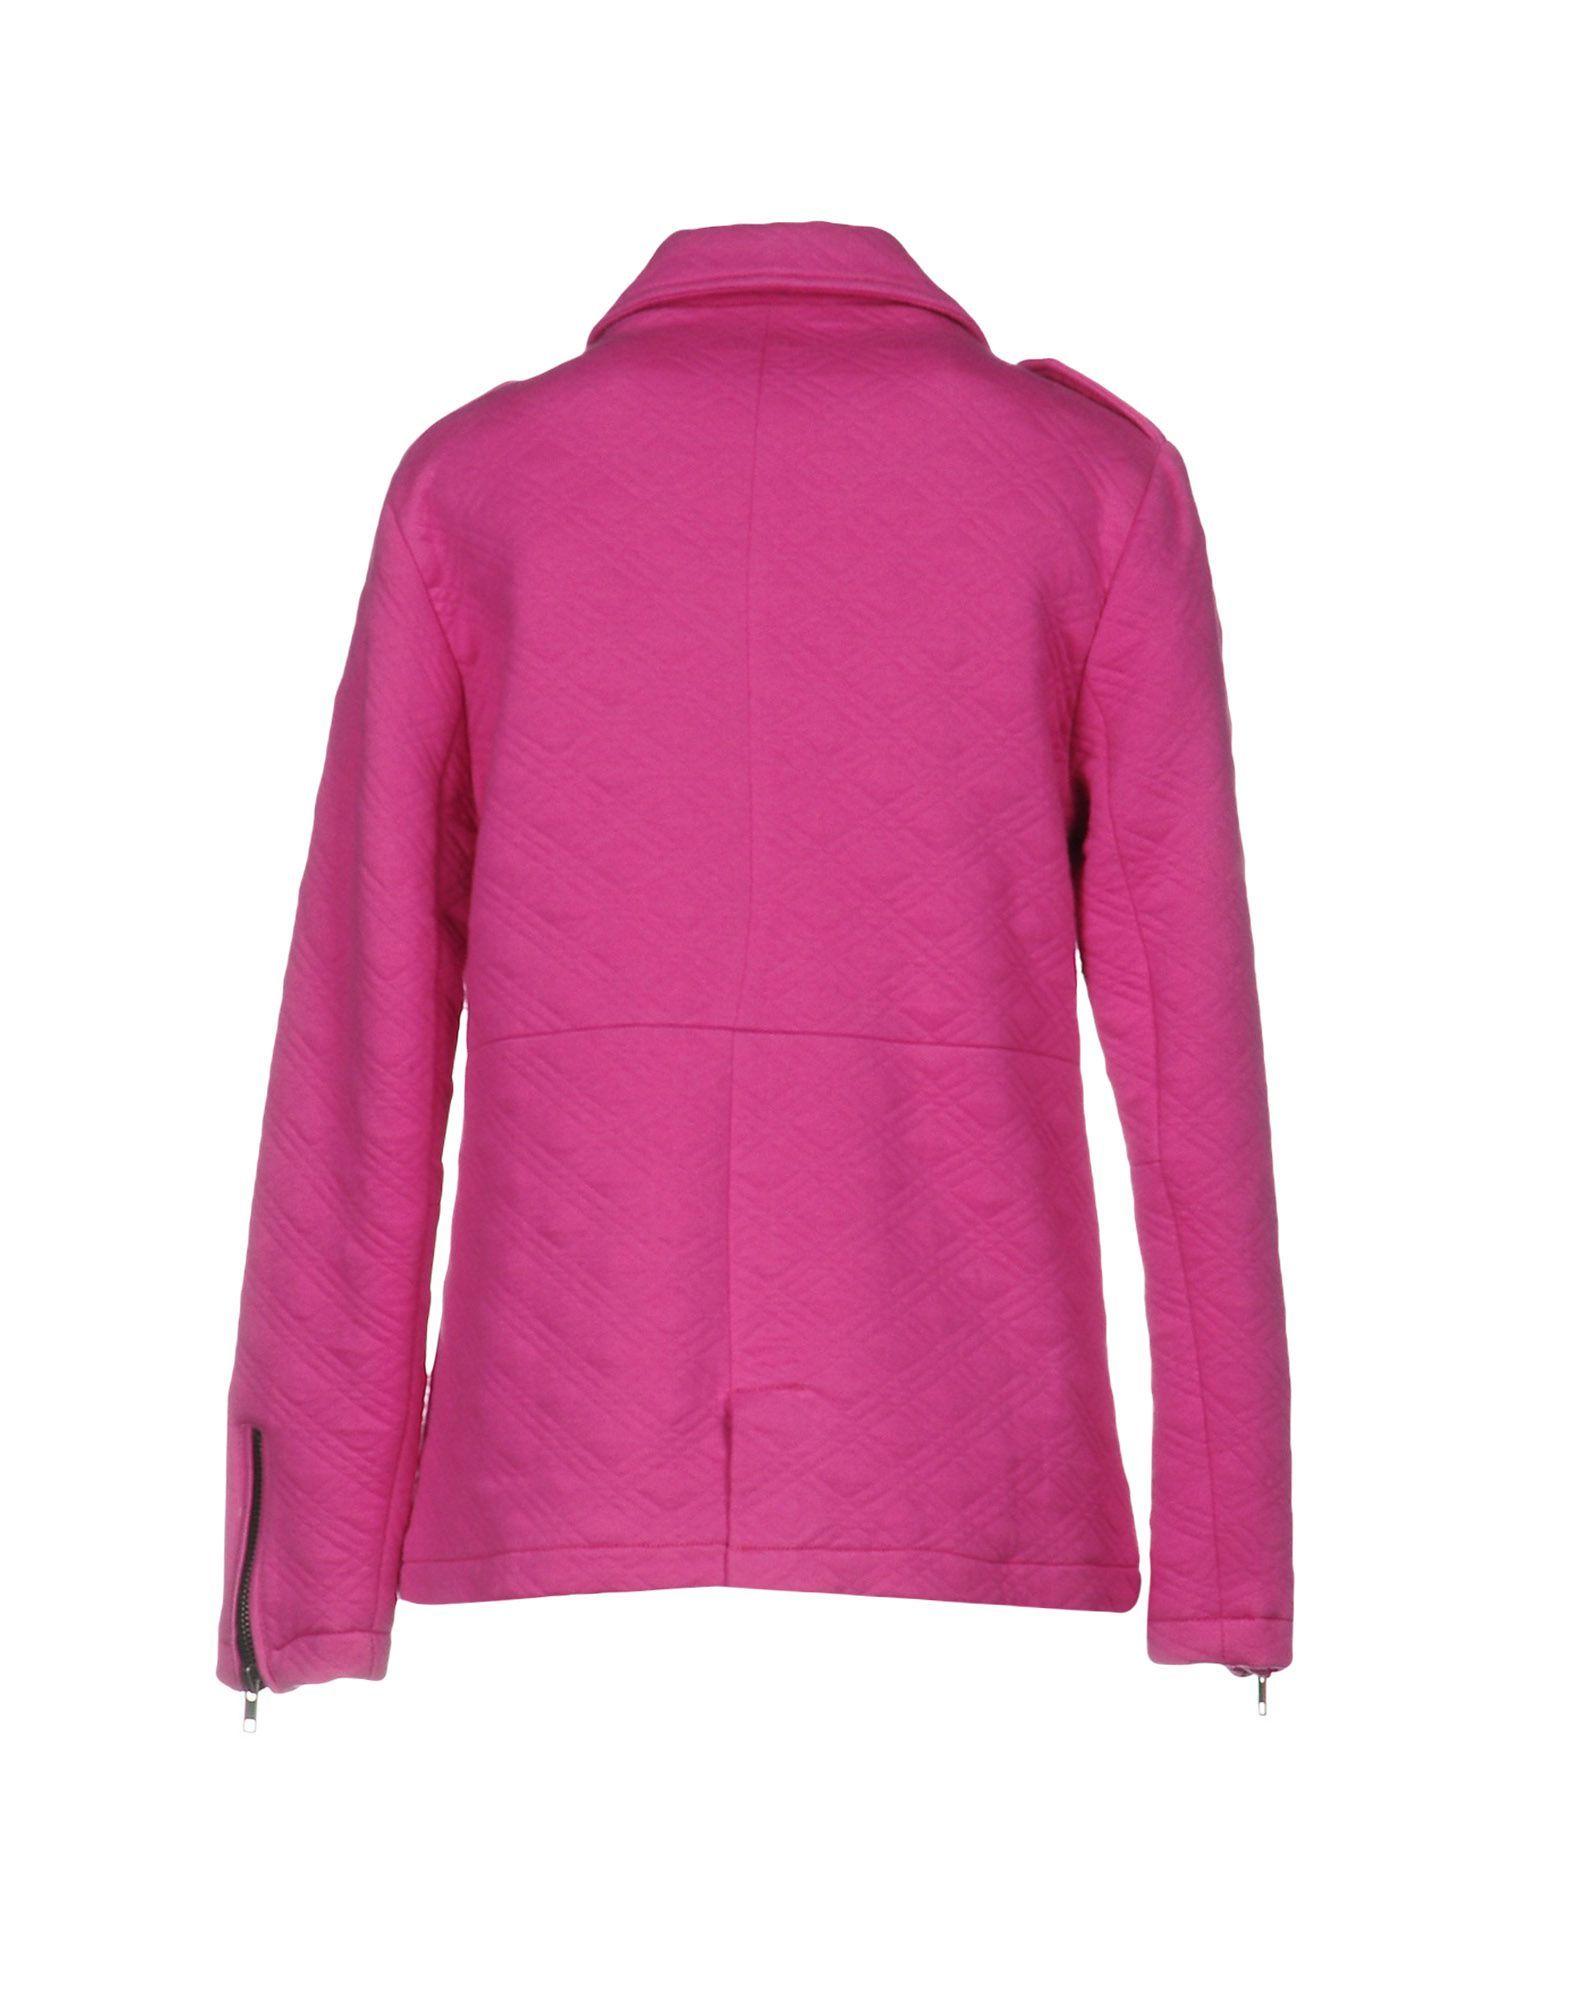 Pepe Jeans Fuchsia Cotton Biker Jacket